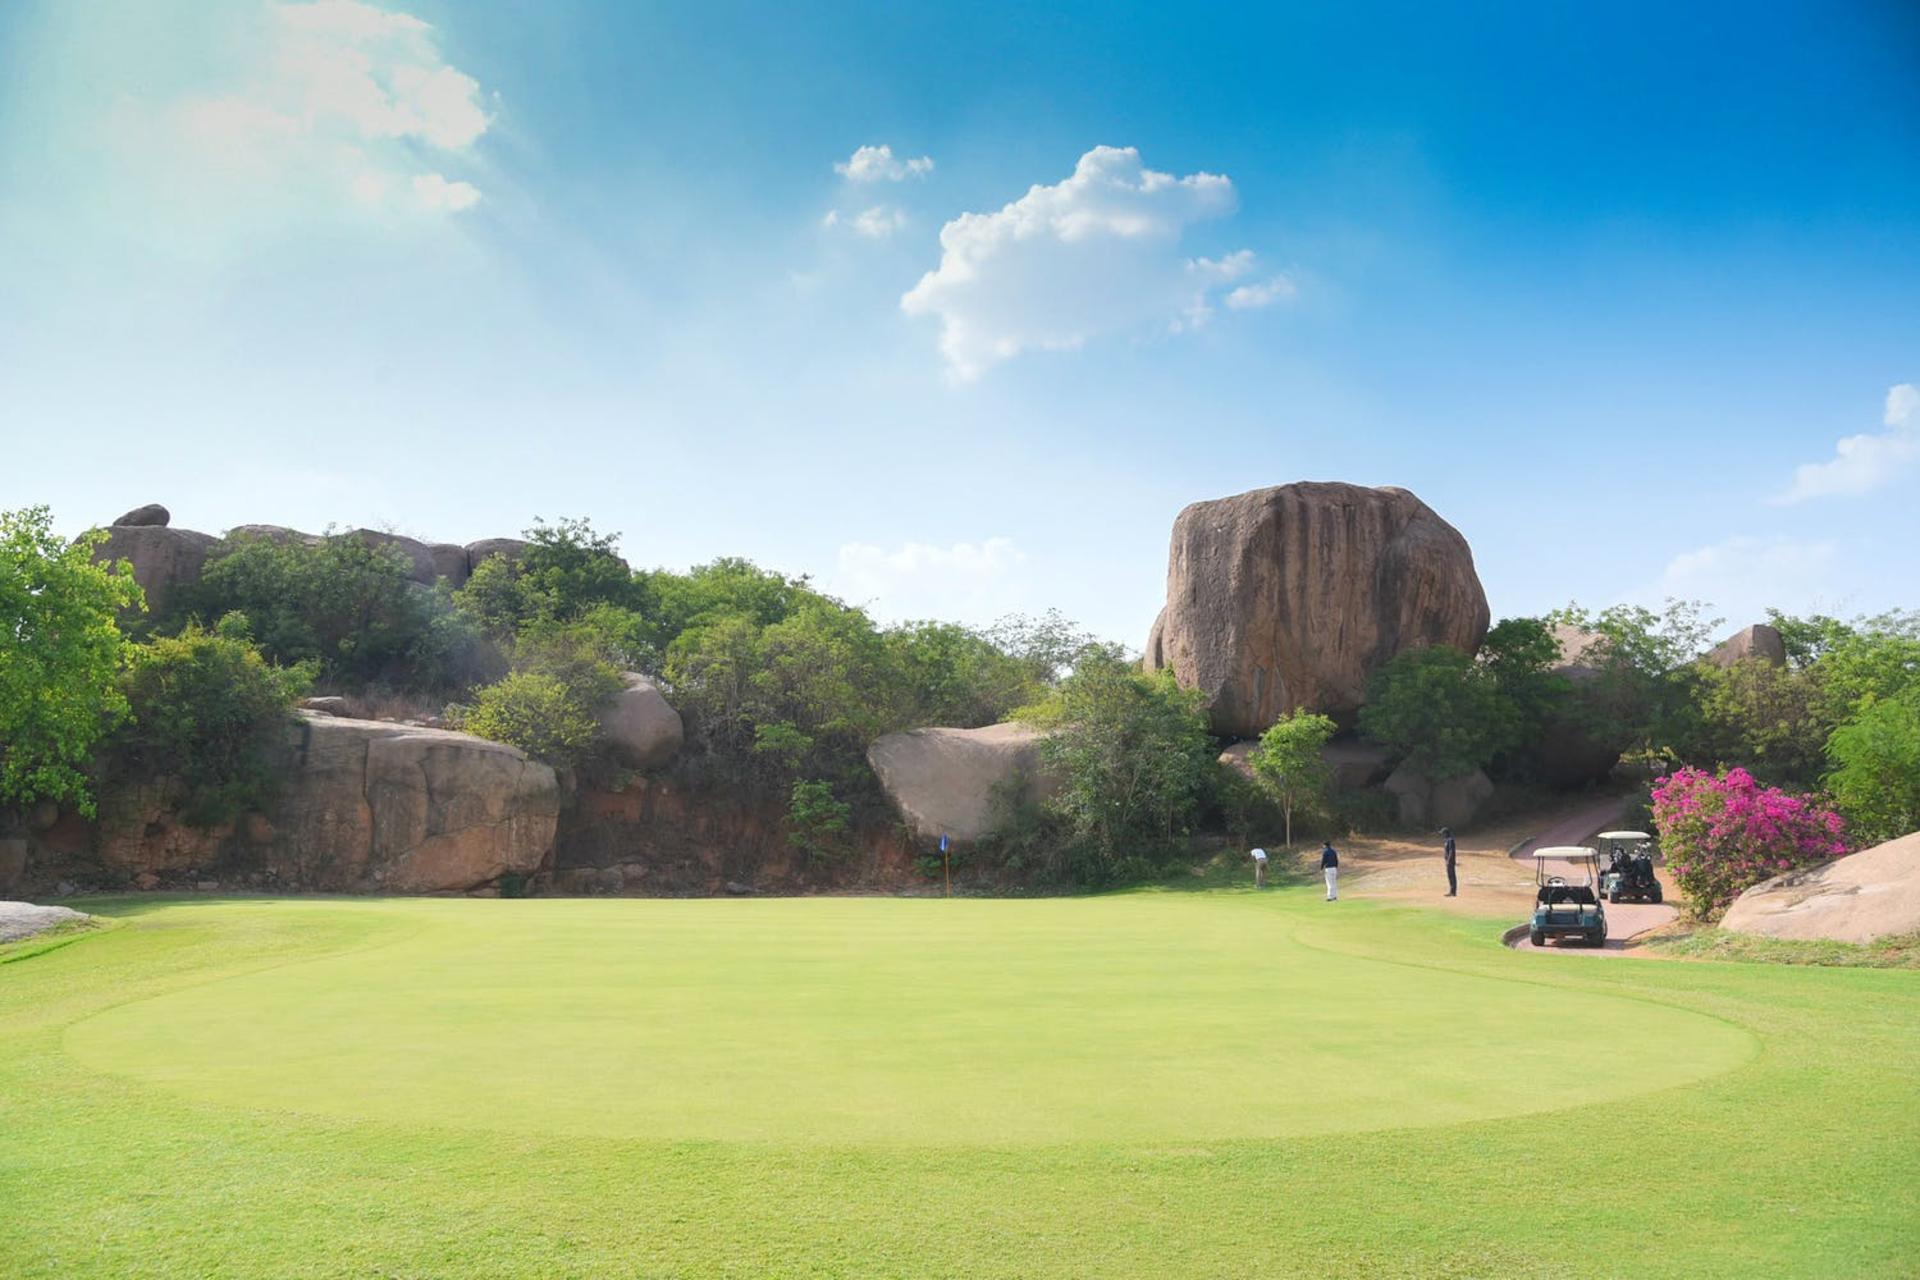 _Girlinskinnyfit_ - Golf Course-1